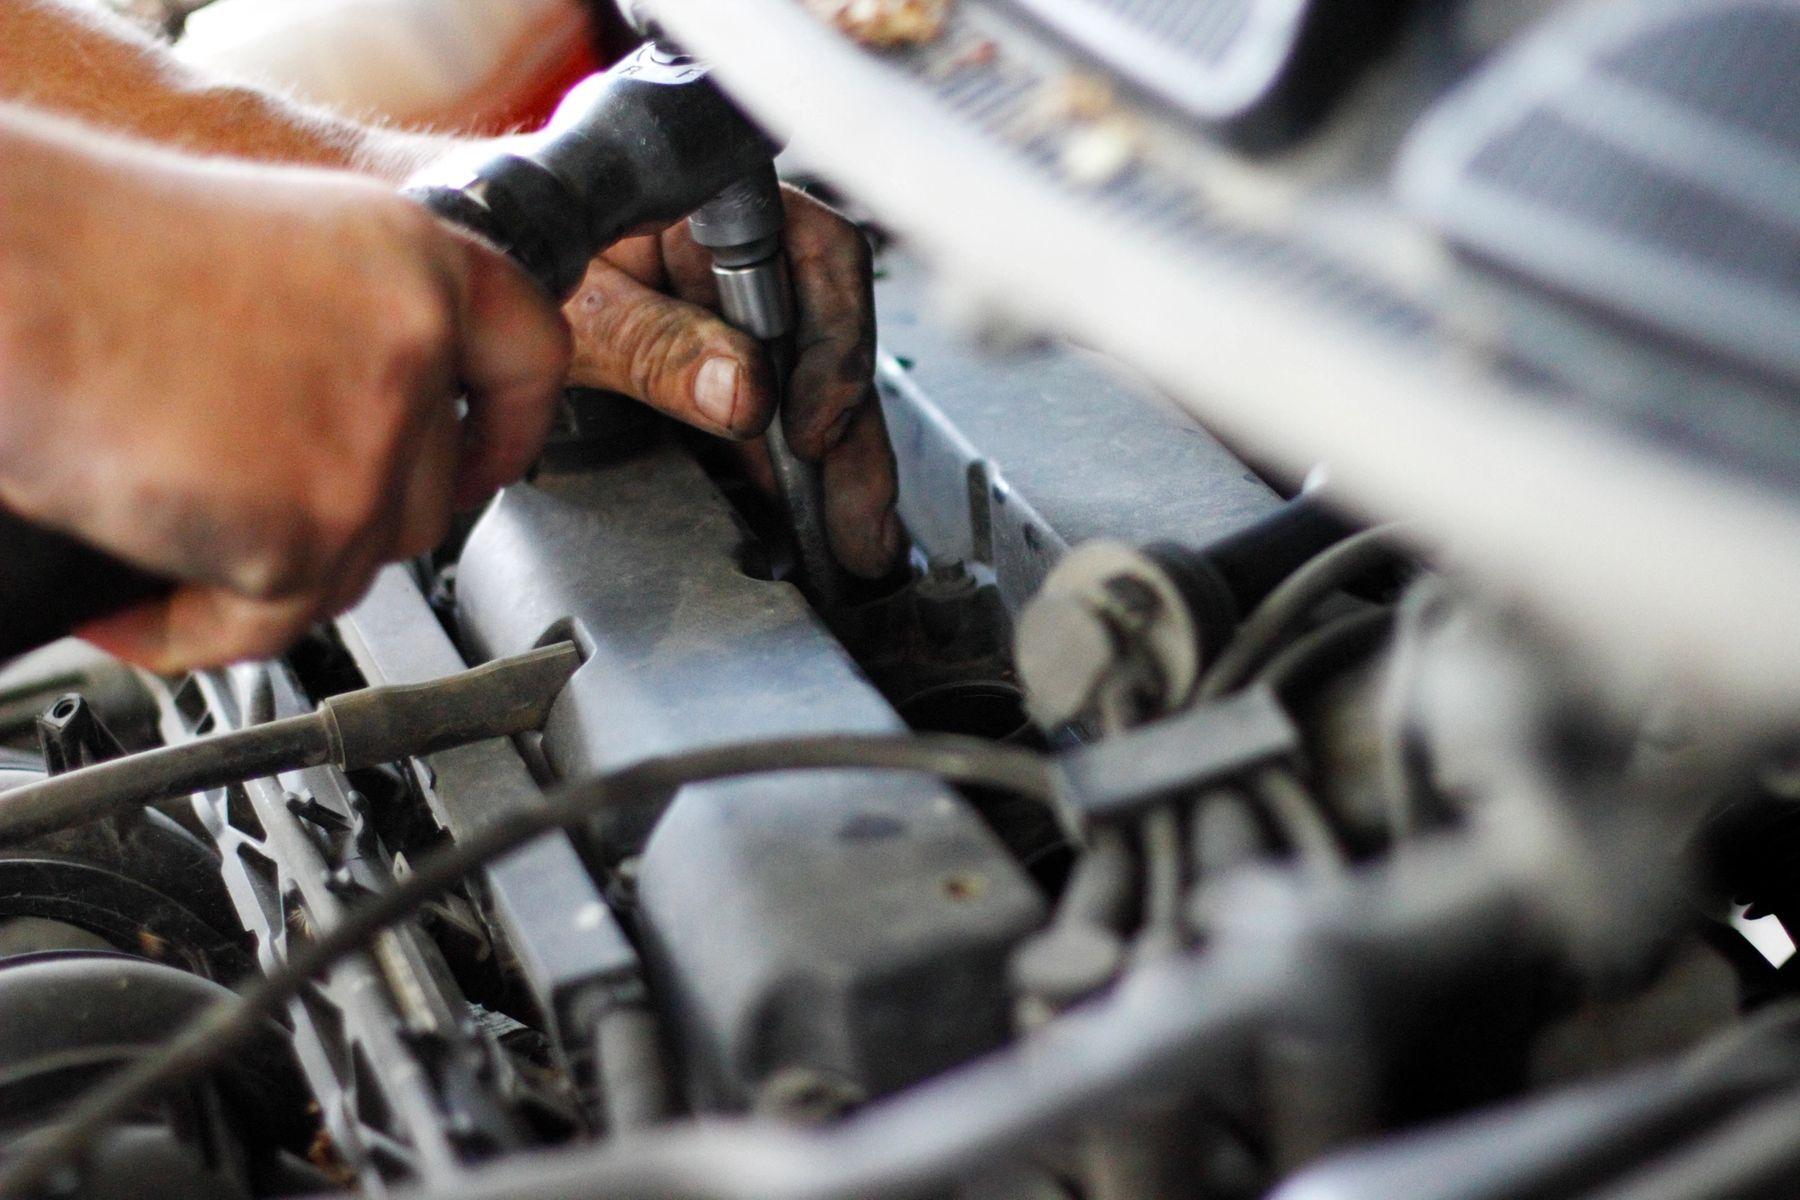 Car Battery & Radiator Replacement   Auto repair, Auto ...